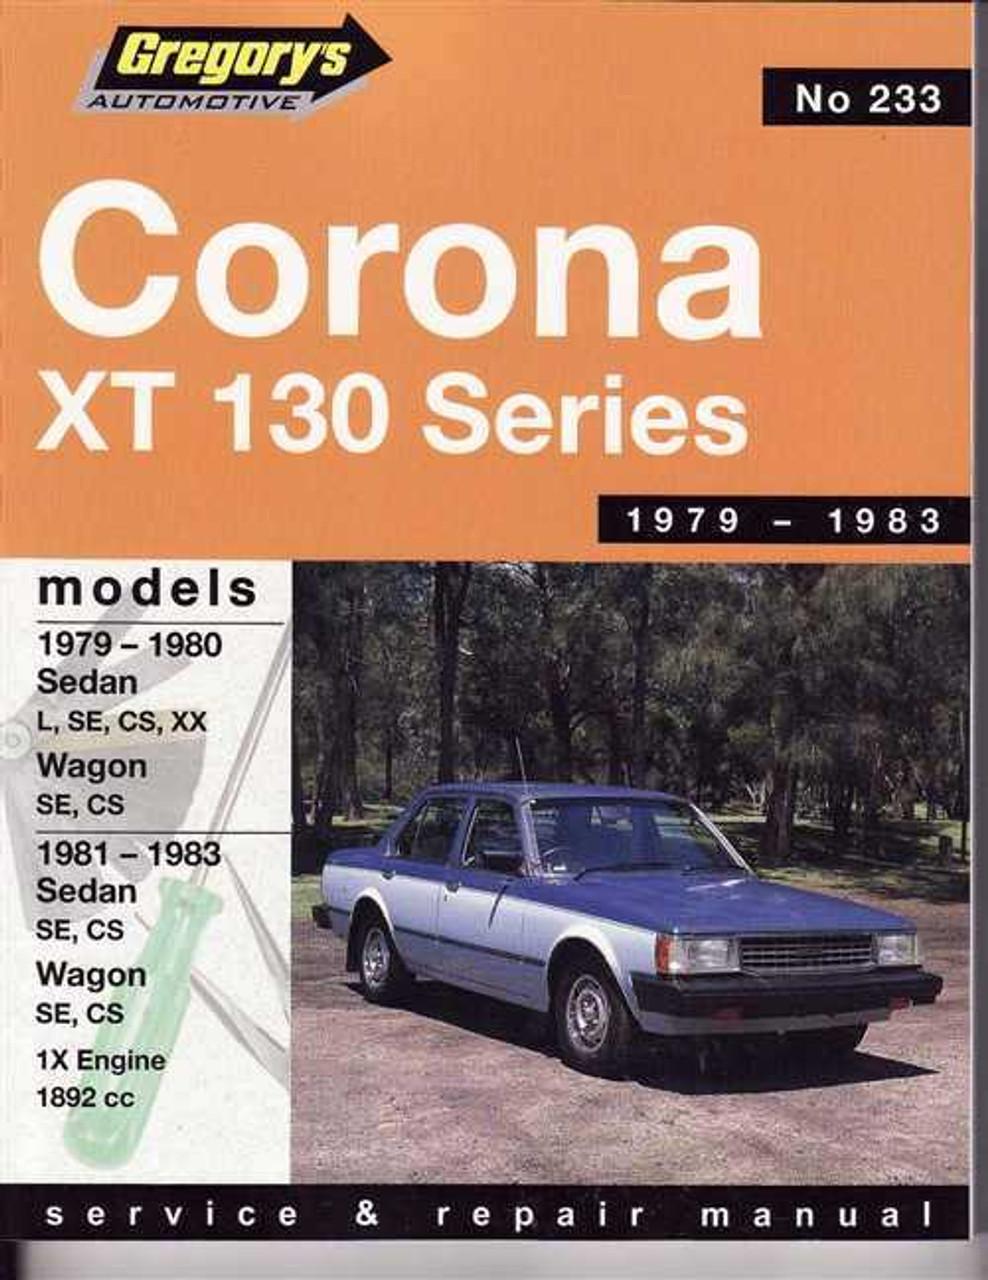 toyota corona xt 130 series 1979 1983 workshop manual rh automotobookshop com au 1980 Toyota Corona 1978 Toyota Corona